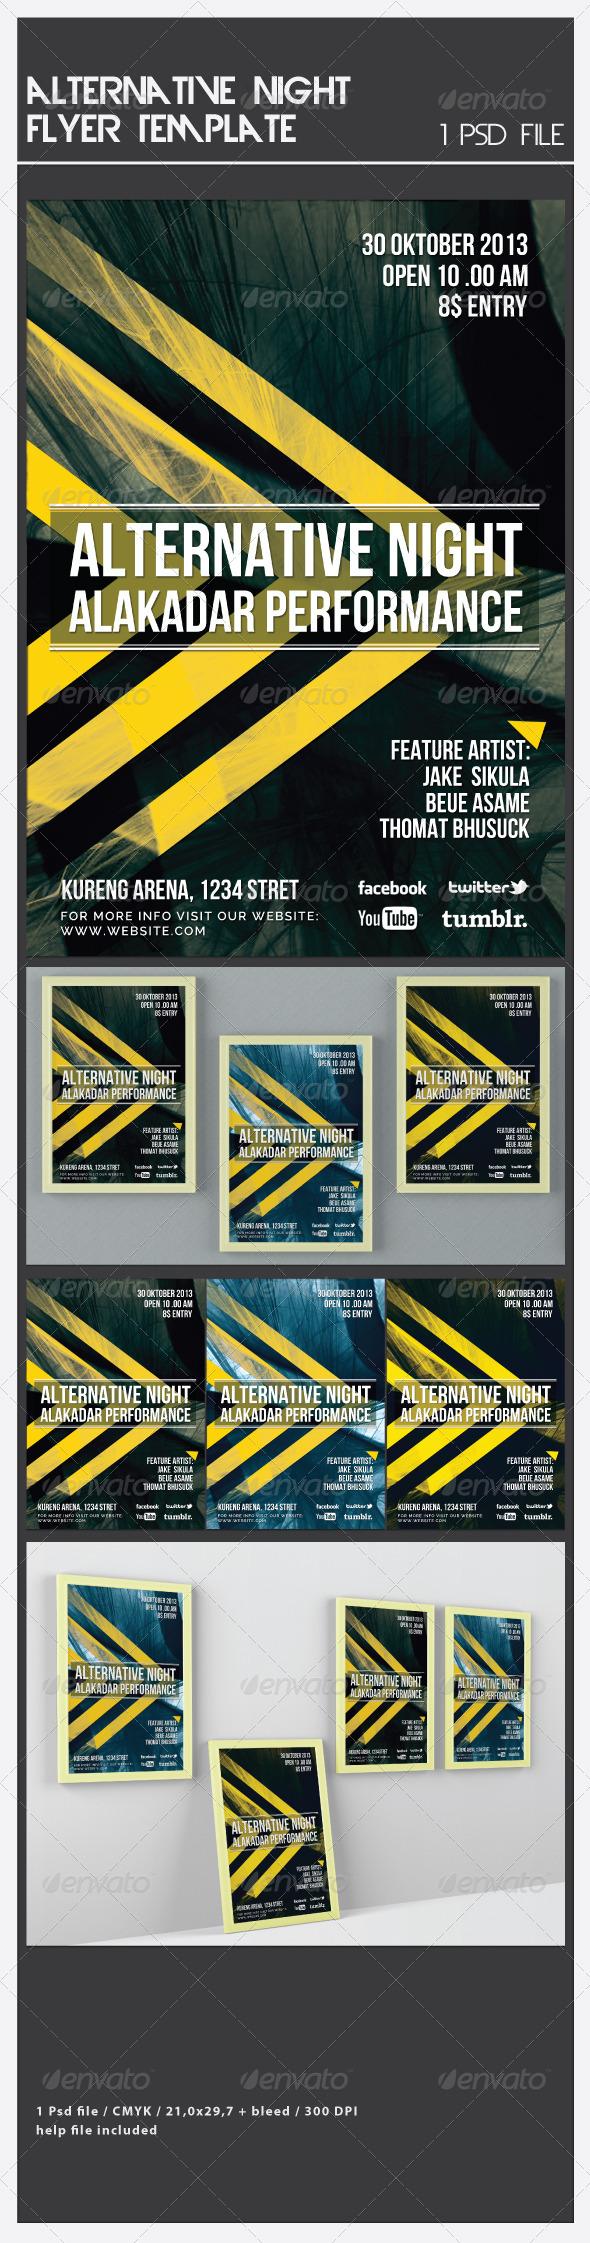 GraphicRiver Alternative Night Flyer Template 6619828